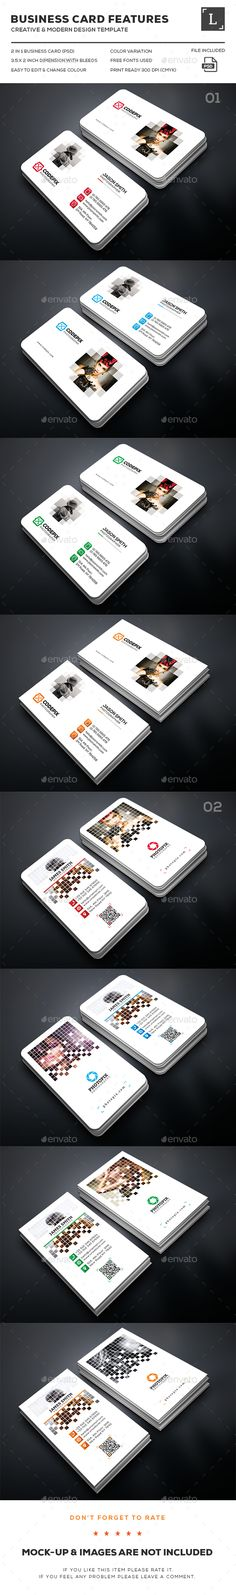 Pixel Photography Business Card Bundle